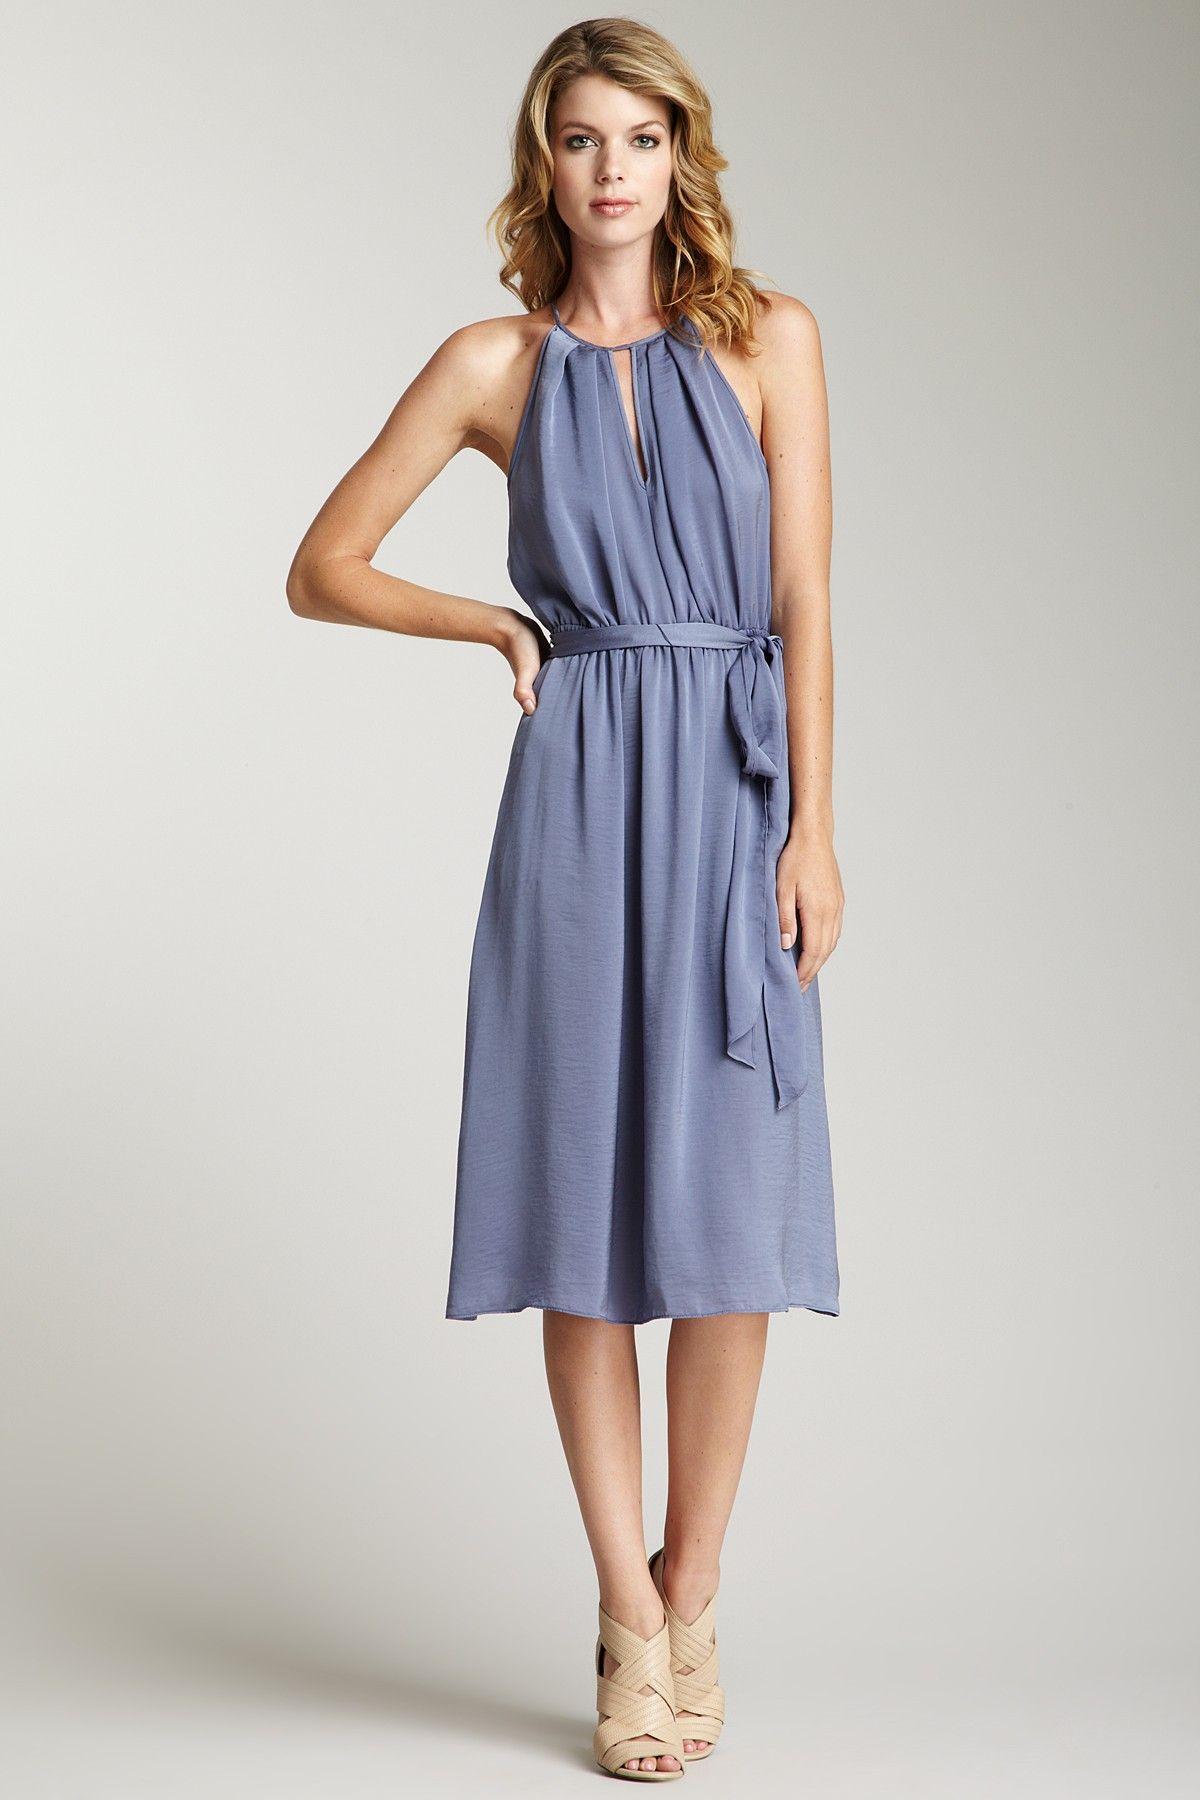 Pretty blue dress dresses pinterest blue dresses clothes and